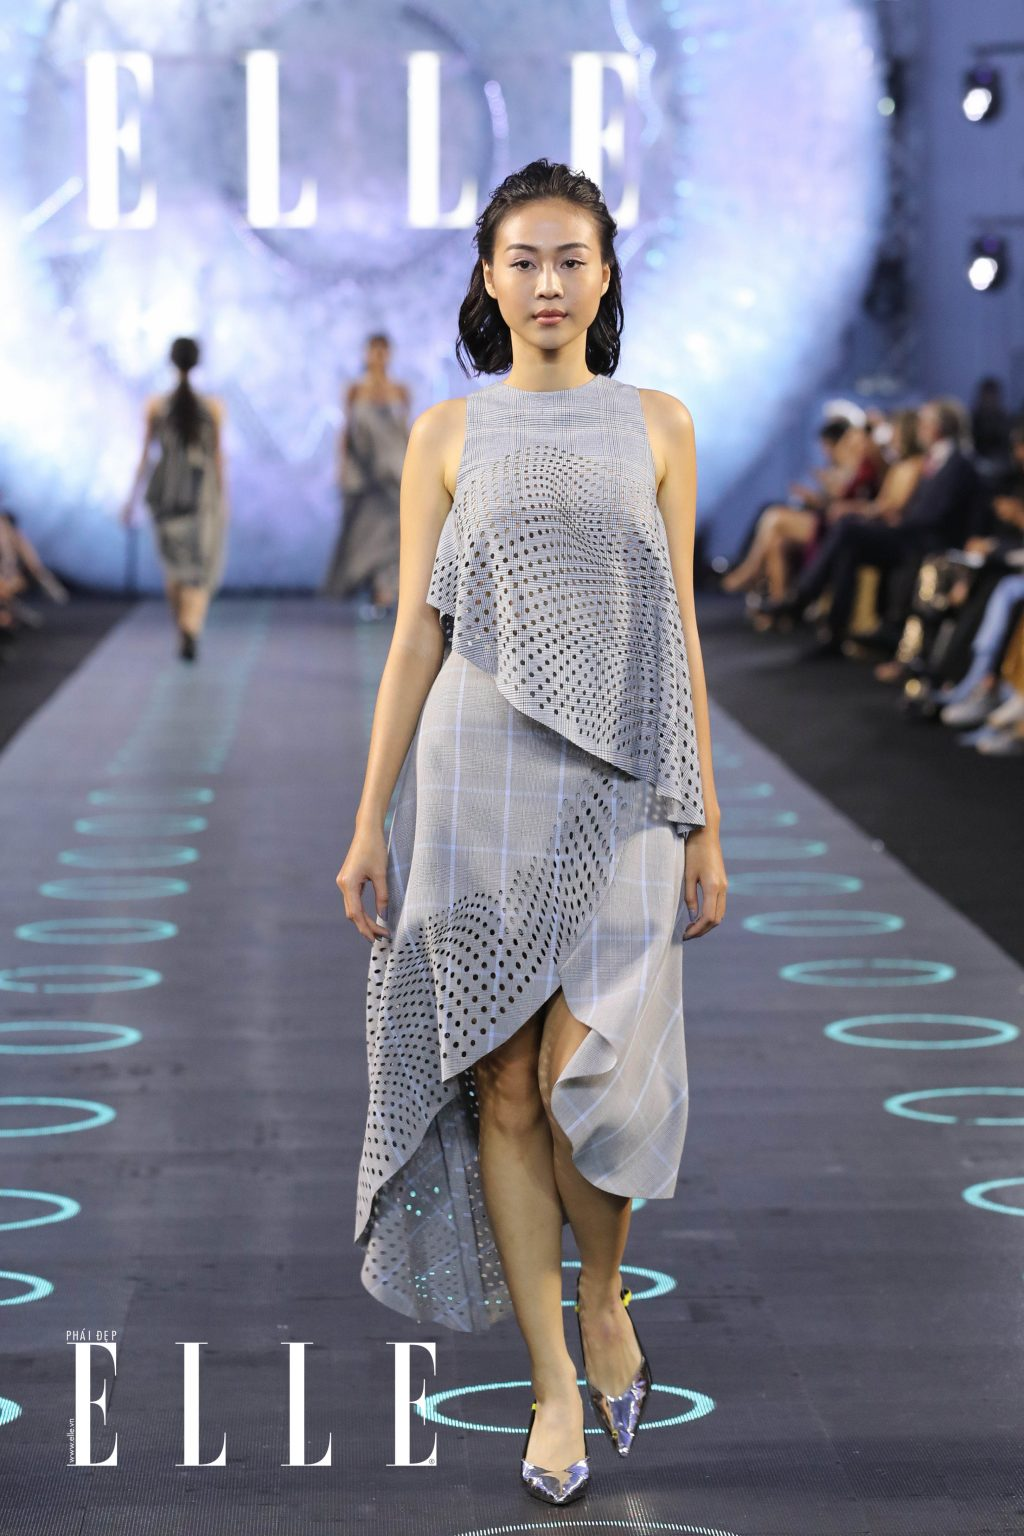 xu huong trang tu nhien diem thong linh san dien elle fashion journey 2018 20